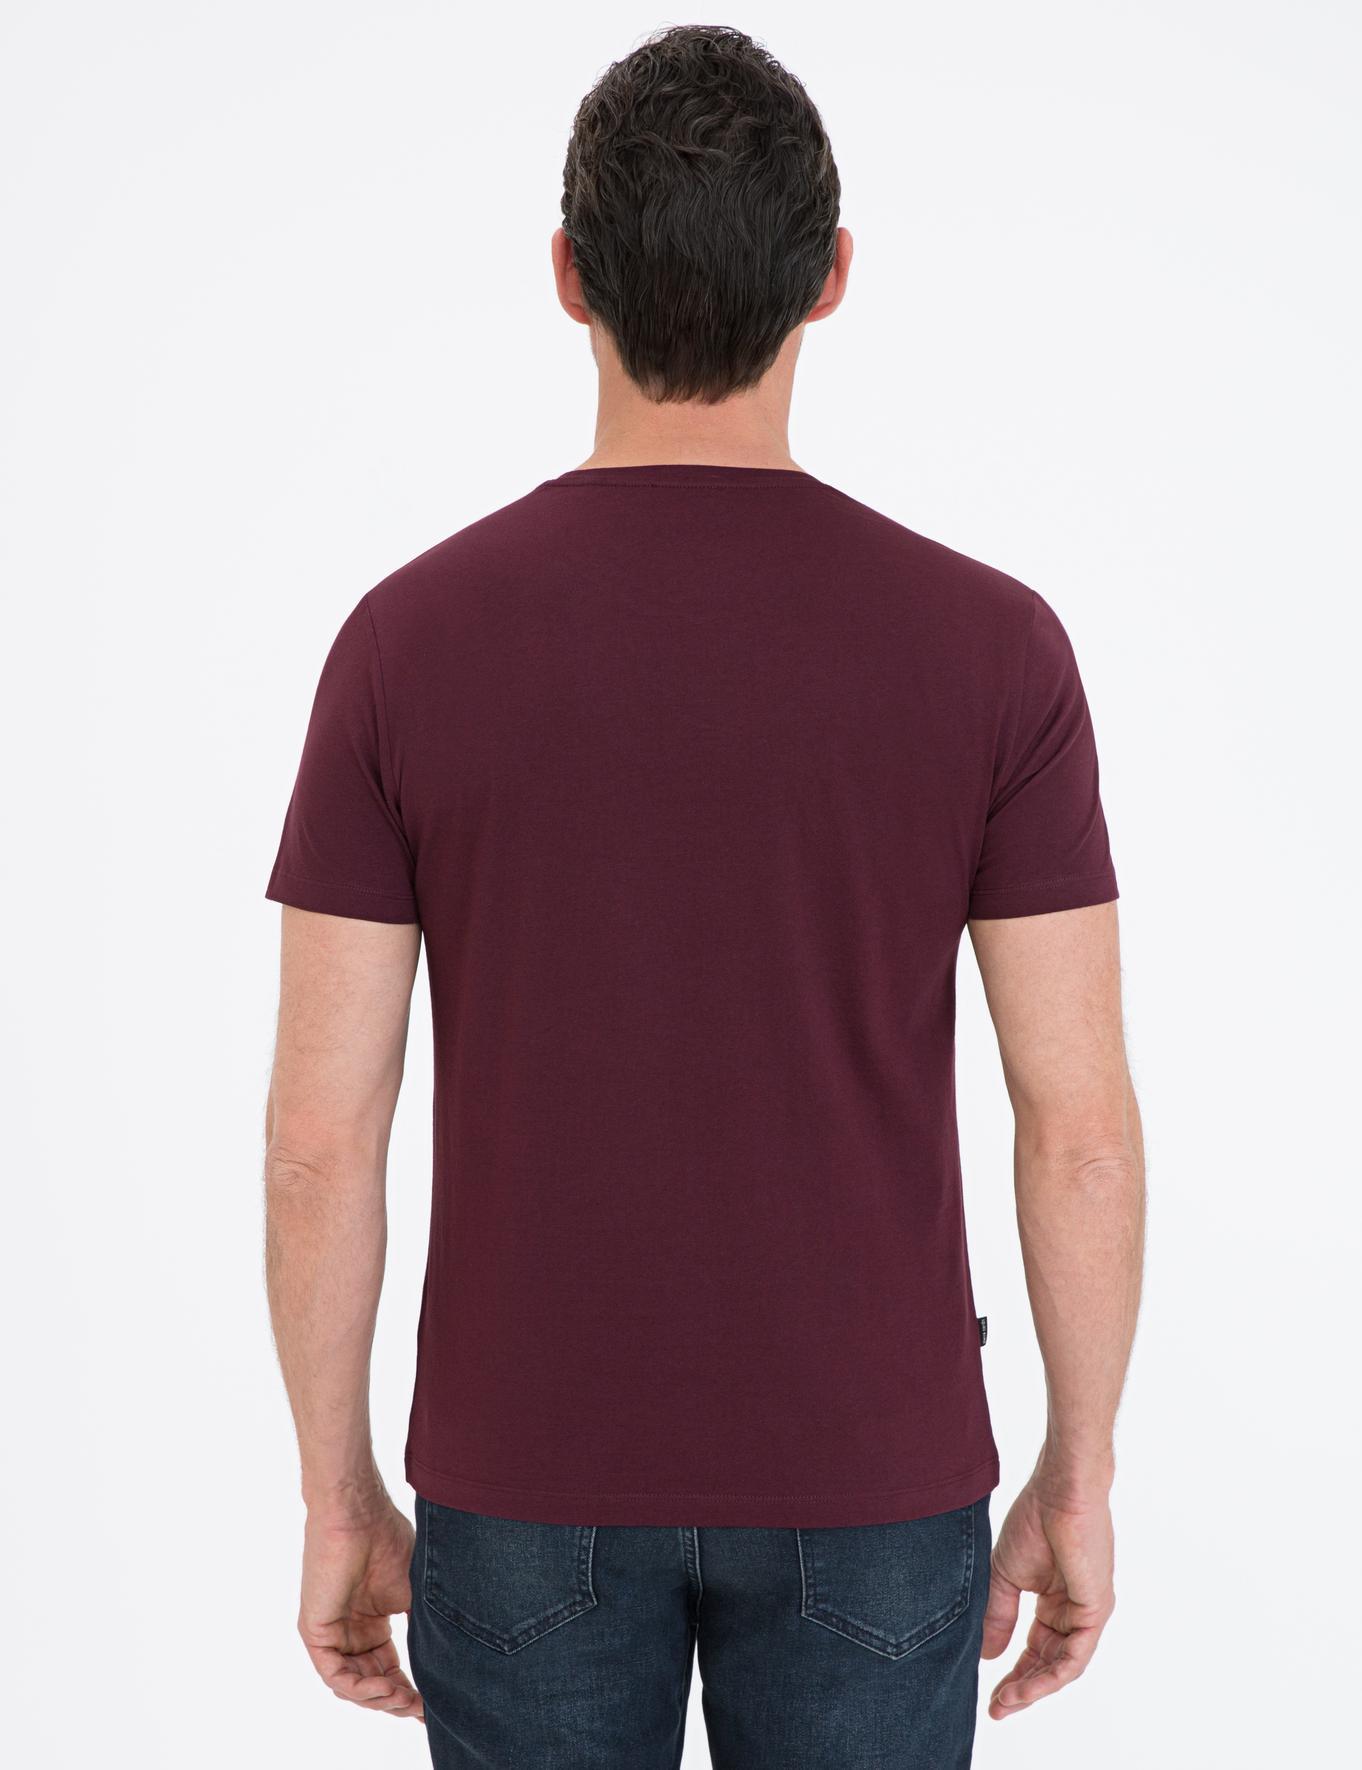 Bordo Slim Fit Bisiklet Yaka Basic T-Shirt